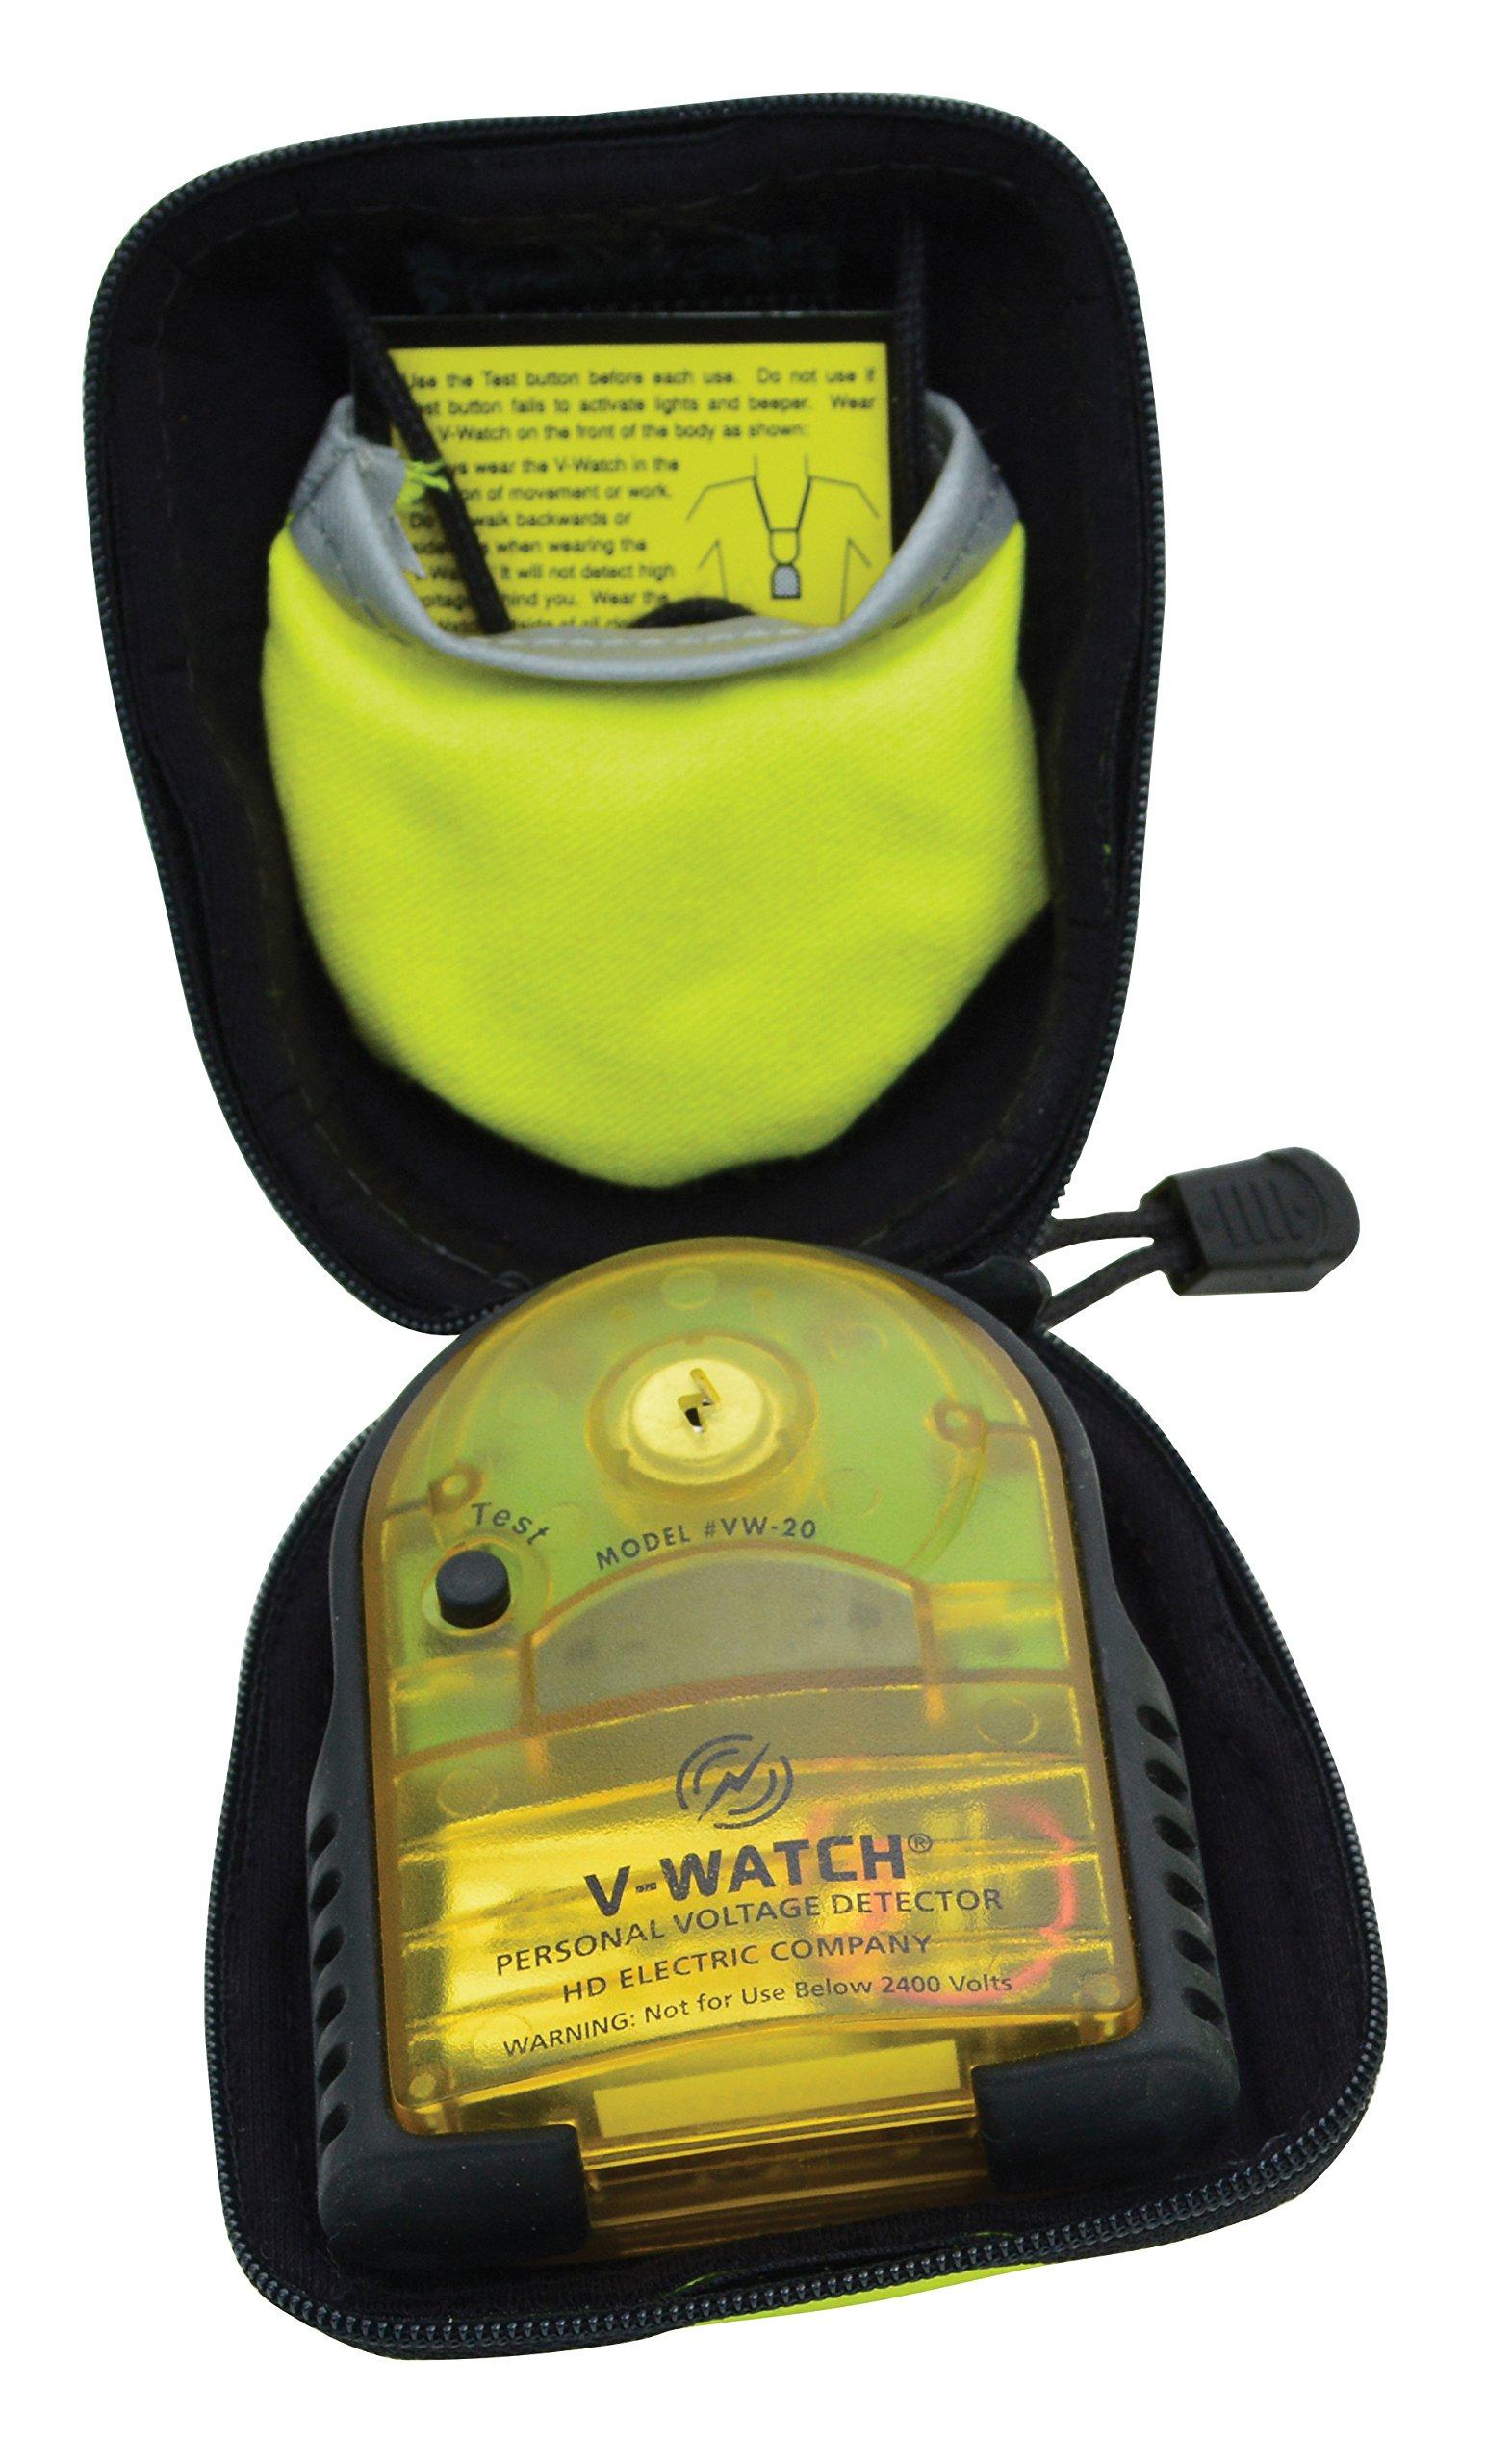 Greenlee VW-20HFR V-Watch Personal Voltage Detector Fr